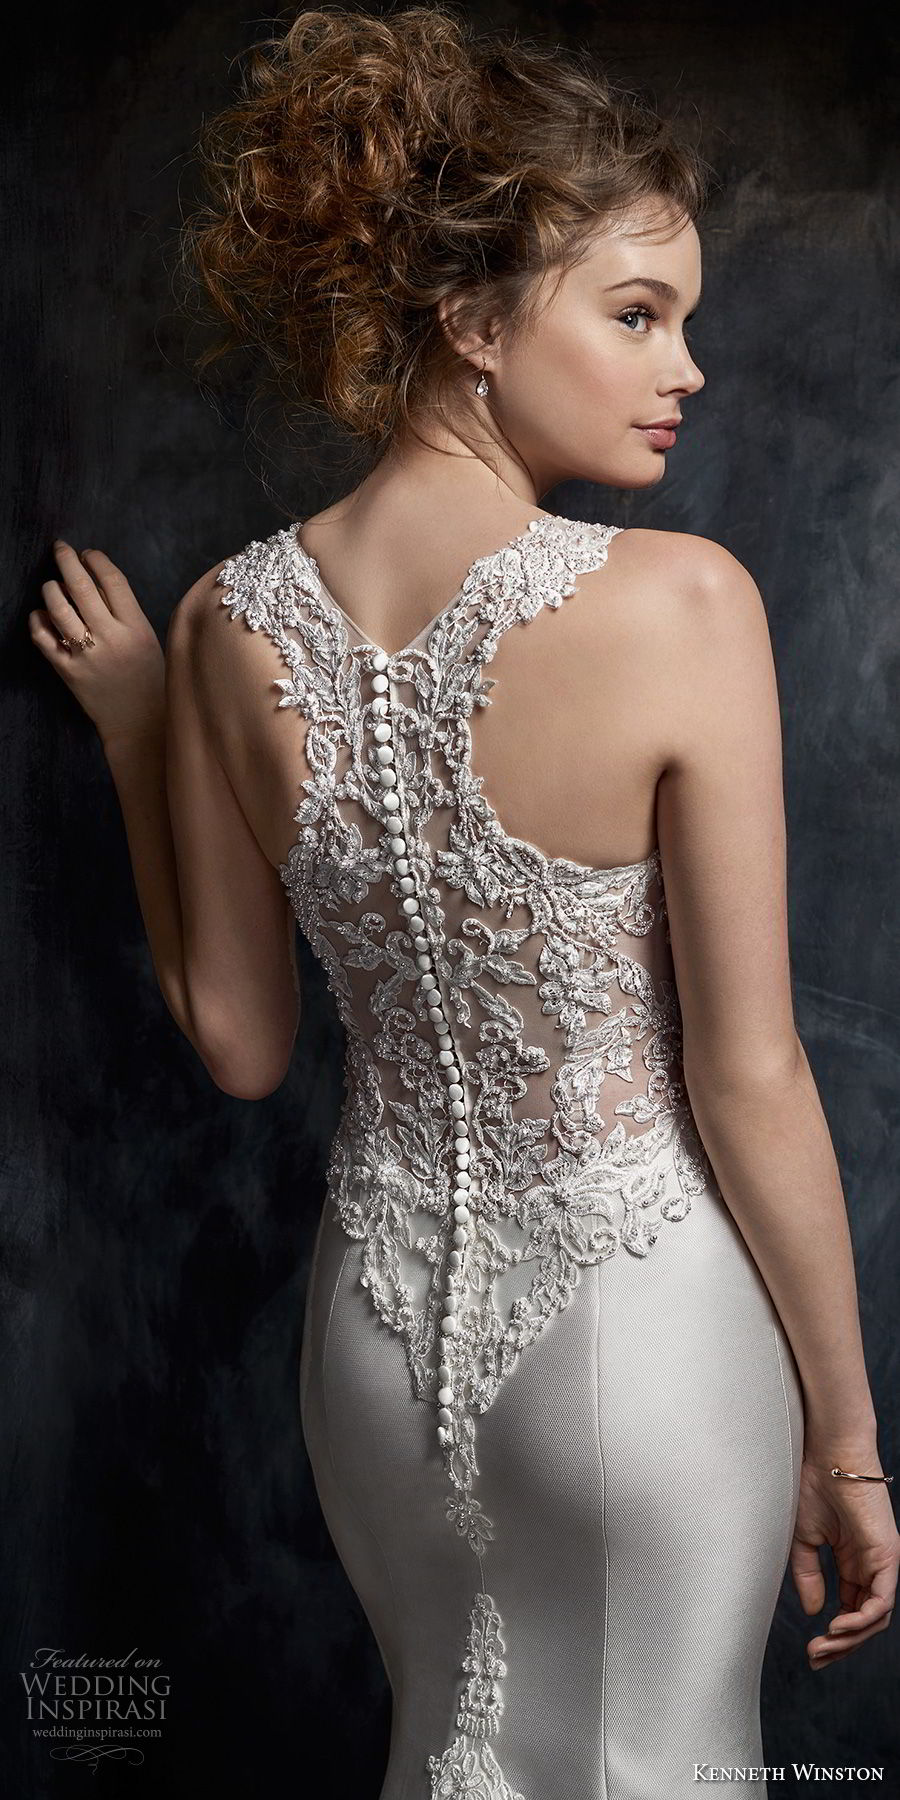 kenneth winston fall 2017 bridal sleeveless embroidered strap v neck heavily embellished bodice satin skirt elegant sheath wedding dress rasor back medium train (41) zbv